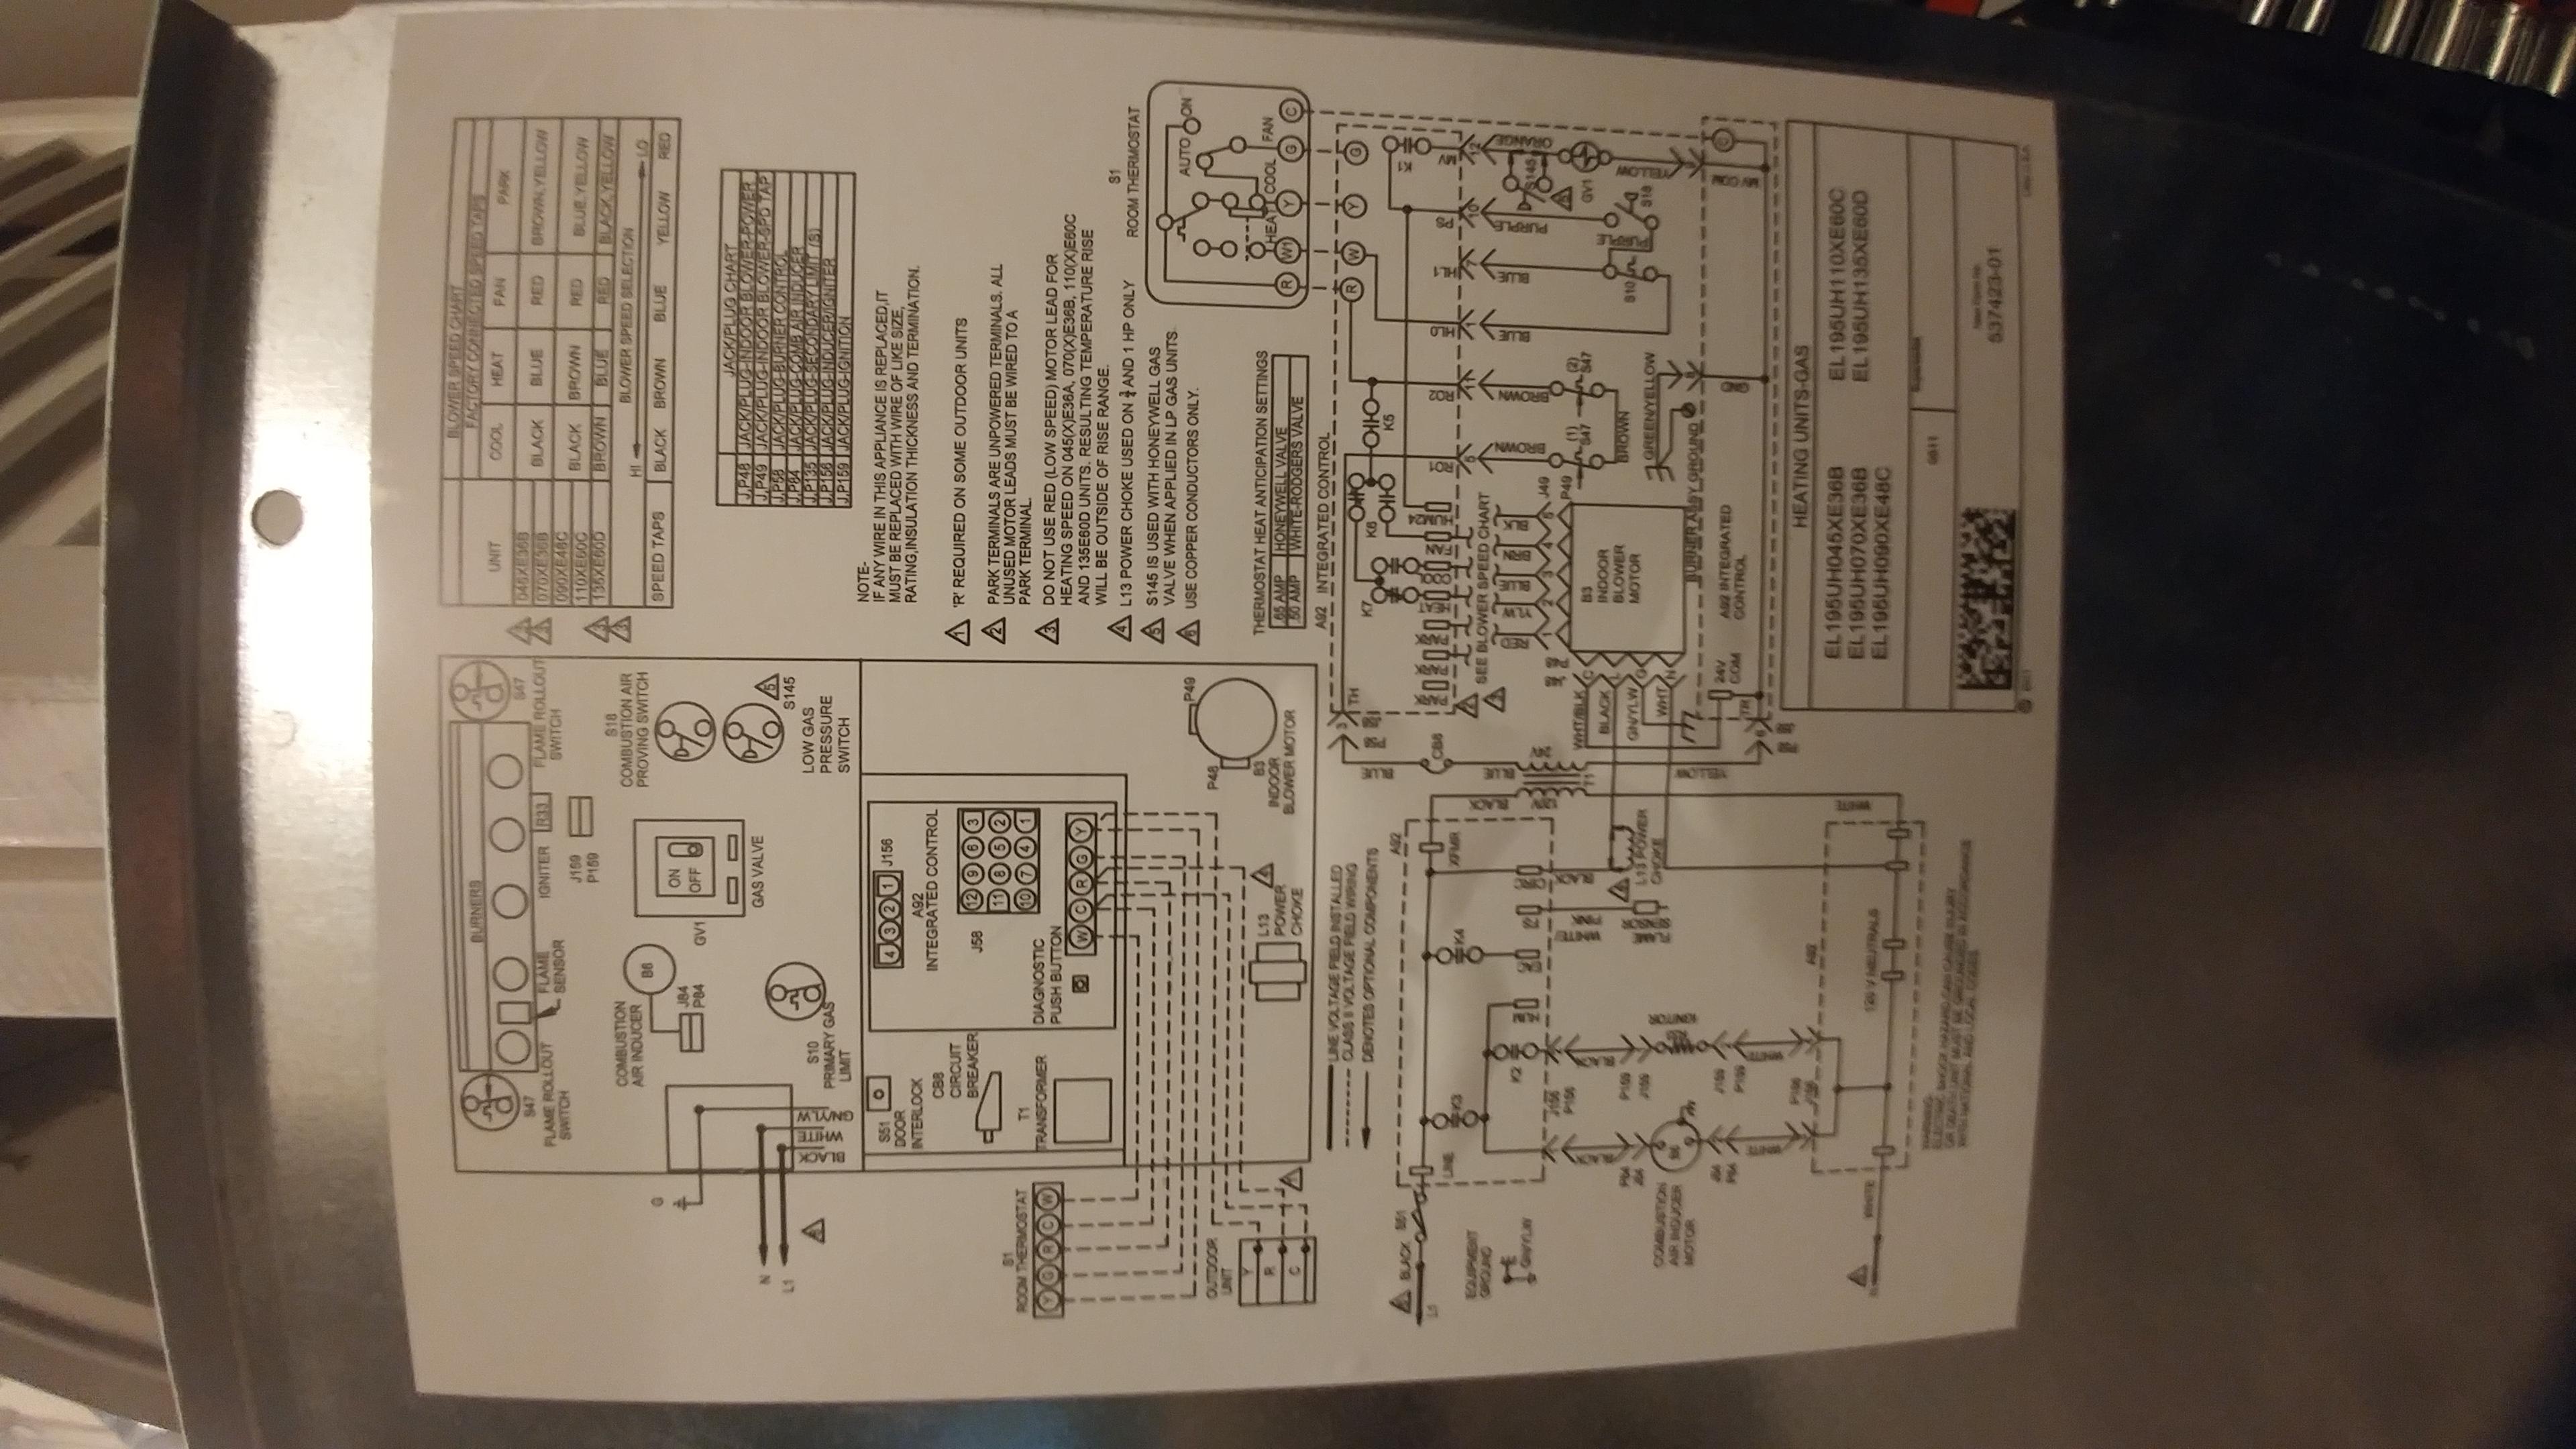 lennox high efficiency furnace. 0922171523_hdr.jpg lennox high efficiency furnace